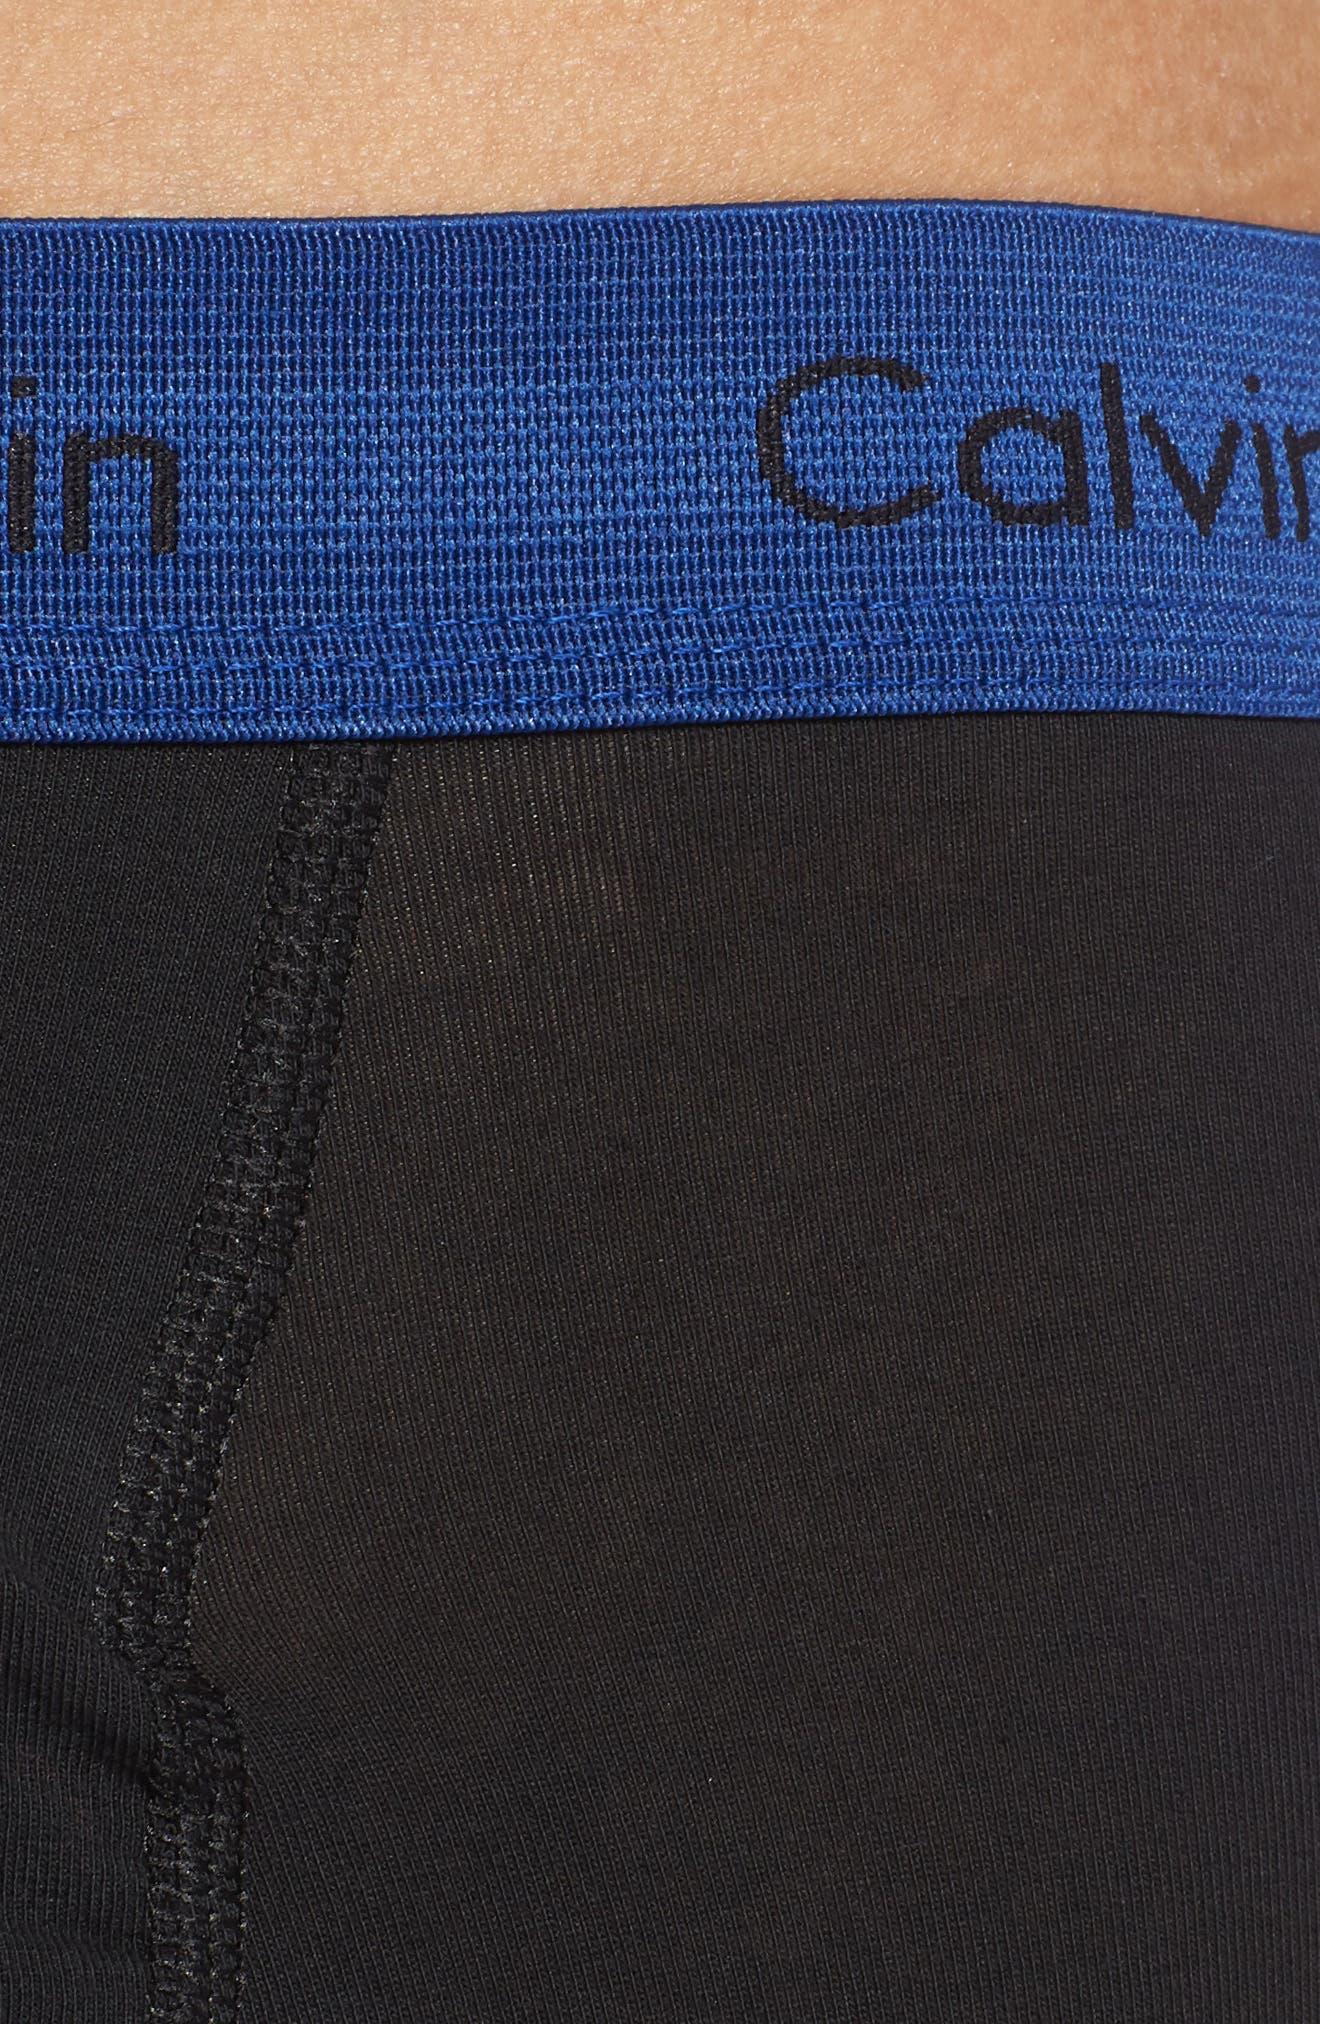 CALVIN KLEIN,                             3-Pack Boxer Briefs,                             Alternate thumbnail 5, color,                             009